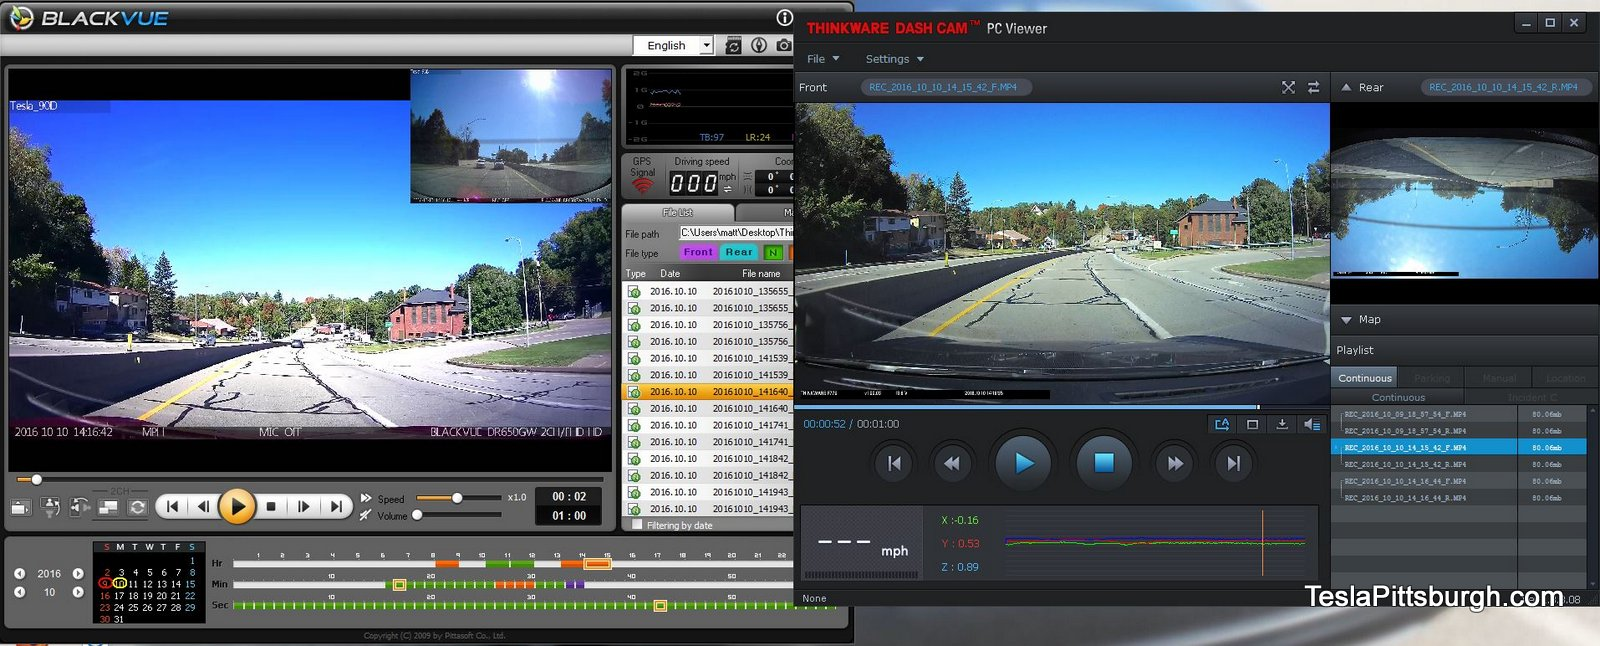 tesla-pittsburgh-dashcam-review-thinkware-f770-camera-software-comparison-daylight-mcknight-1